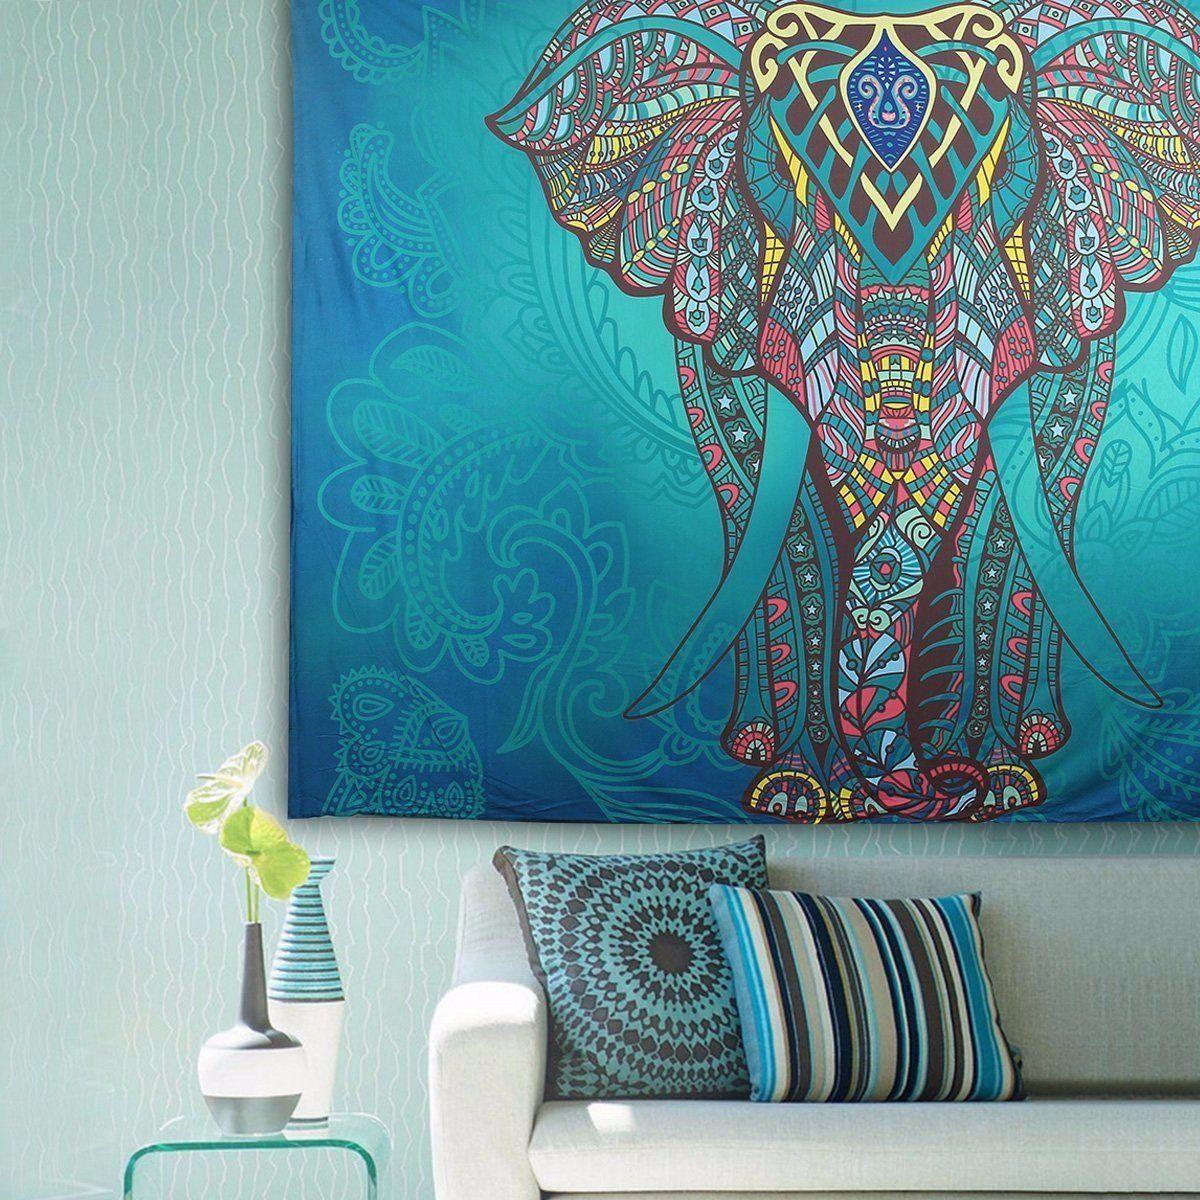 hanging beach towel. Indian Mandala Elephant Tapestry Wall Hanging Blanket Beach Towel Throw Yaga Bedspread Curtain M